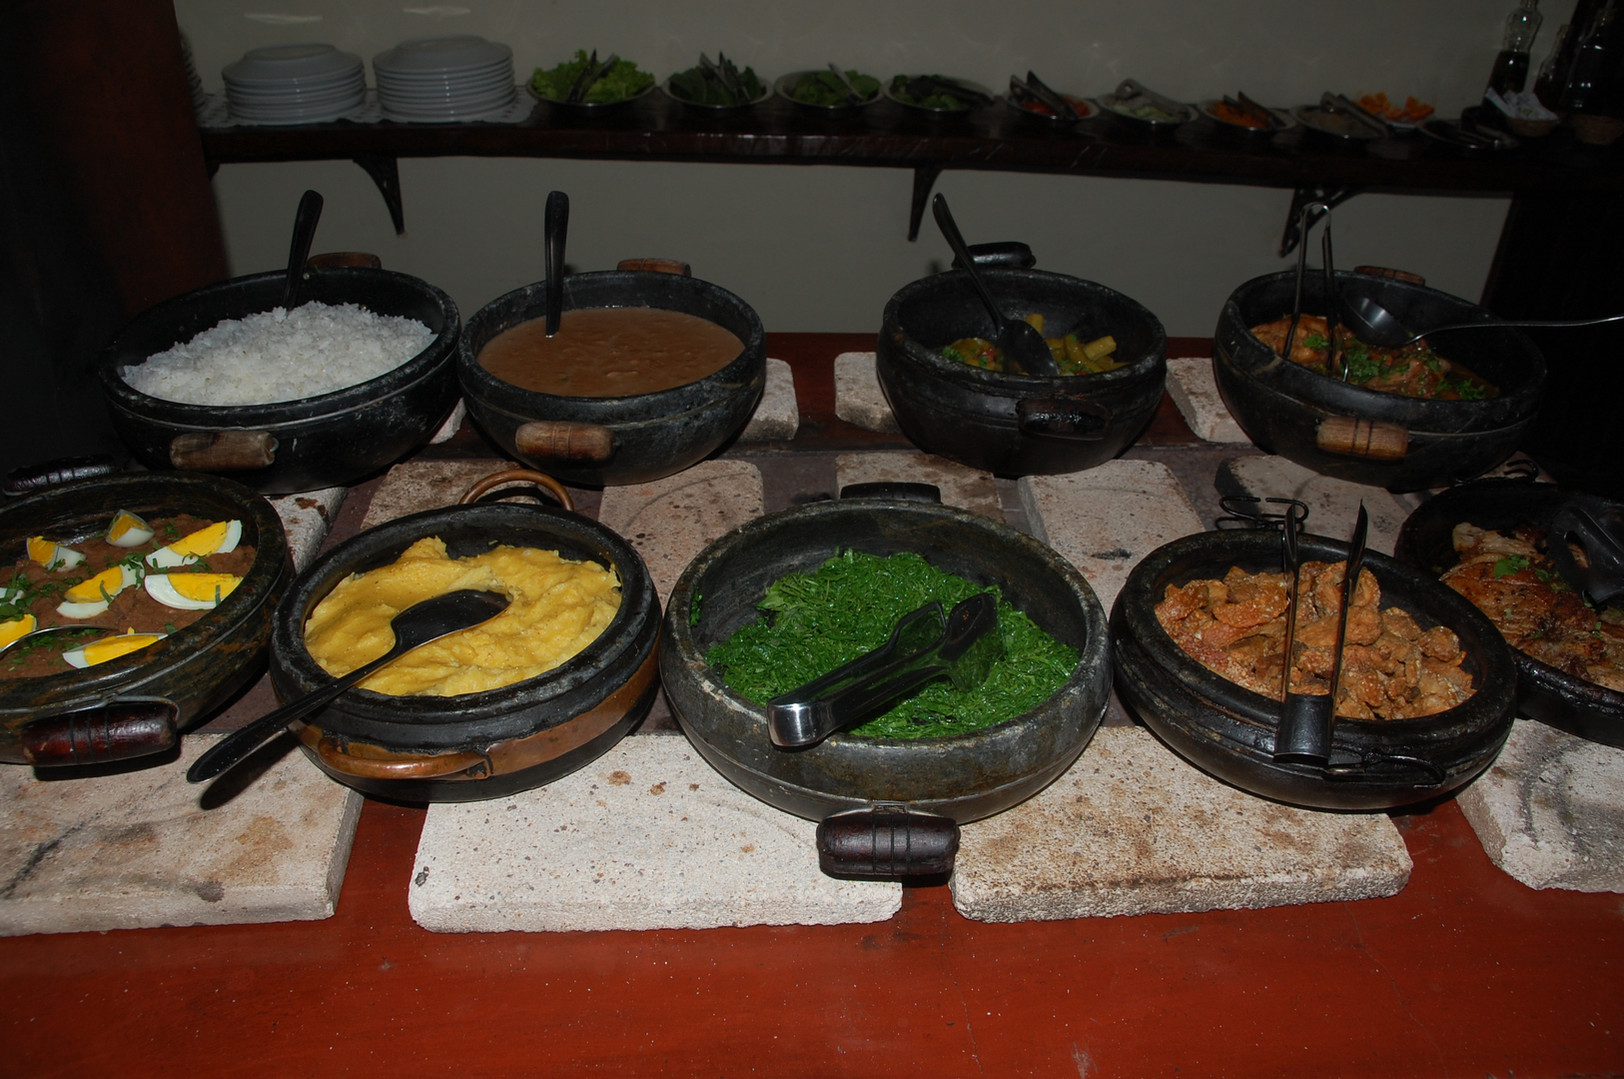 g - Gastronomia 2013-11 (2).JPG